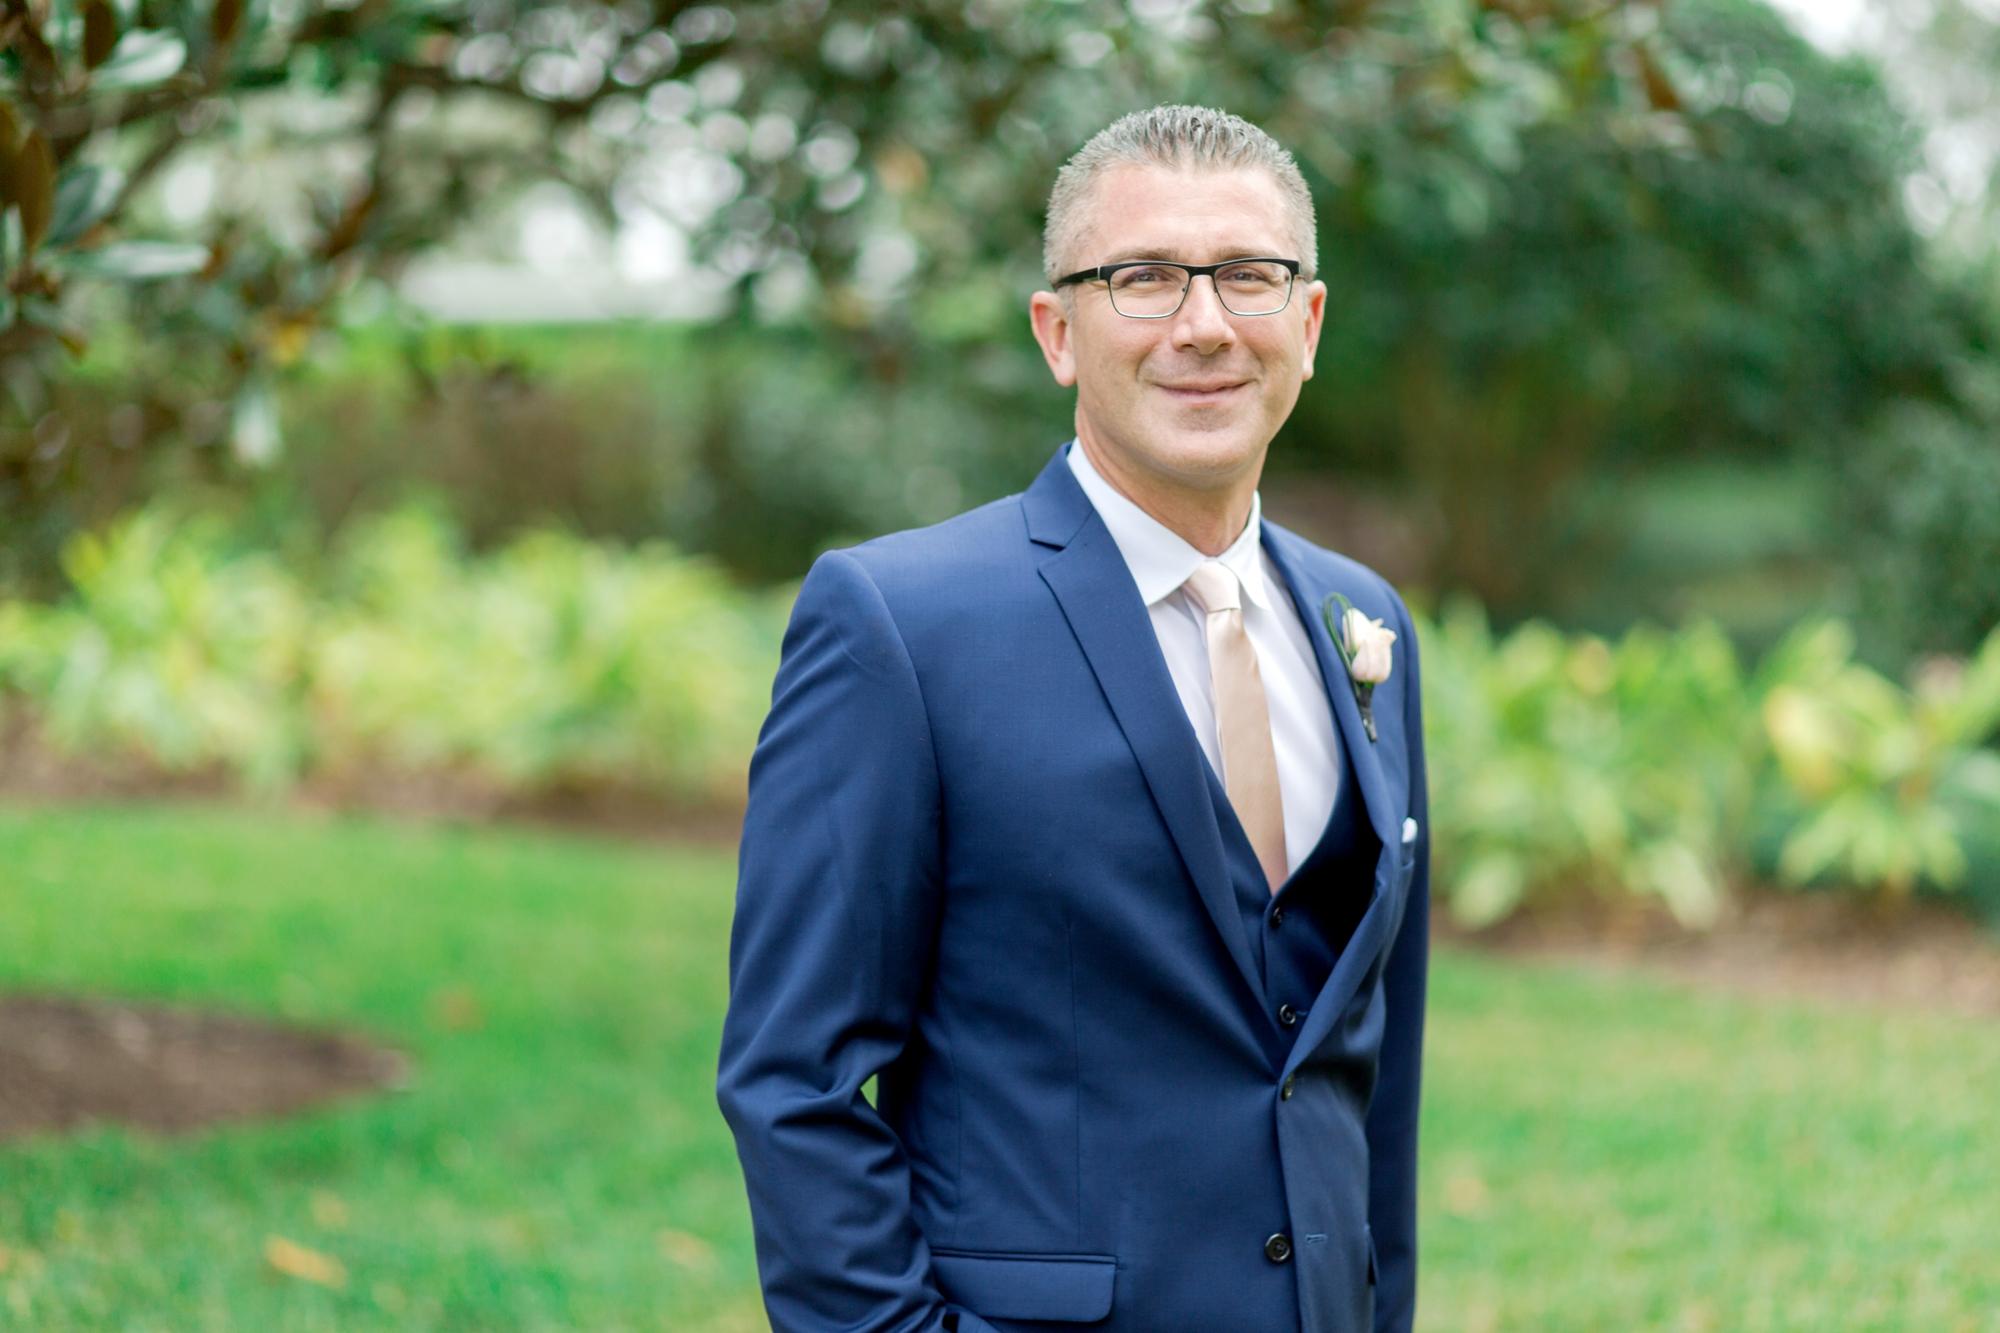 classic groom look